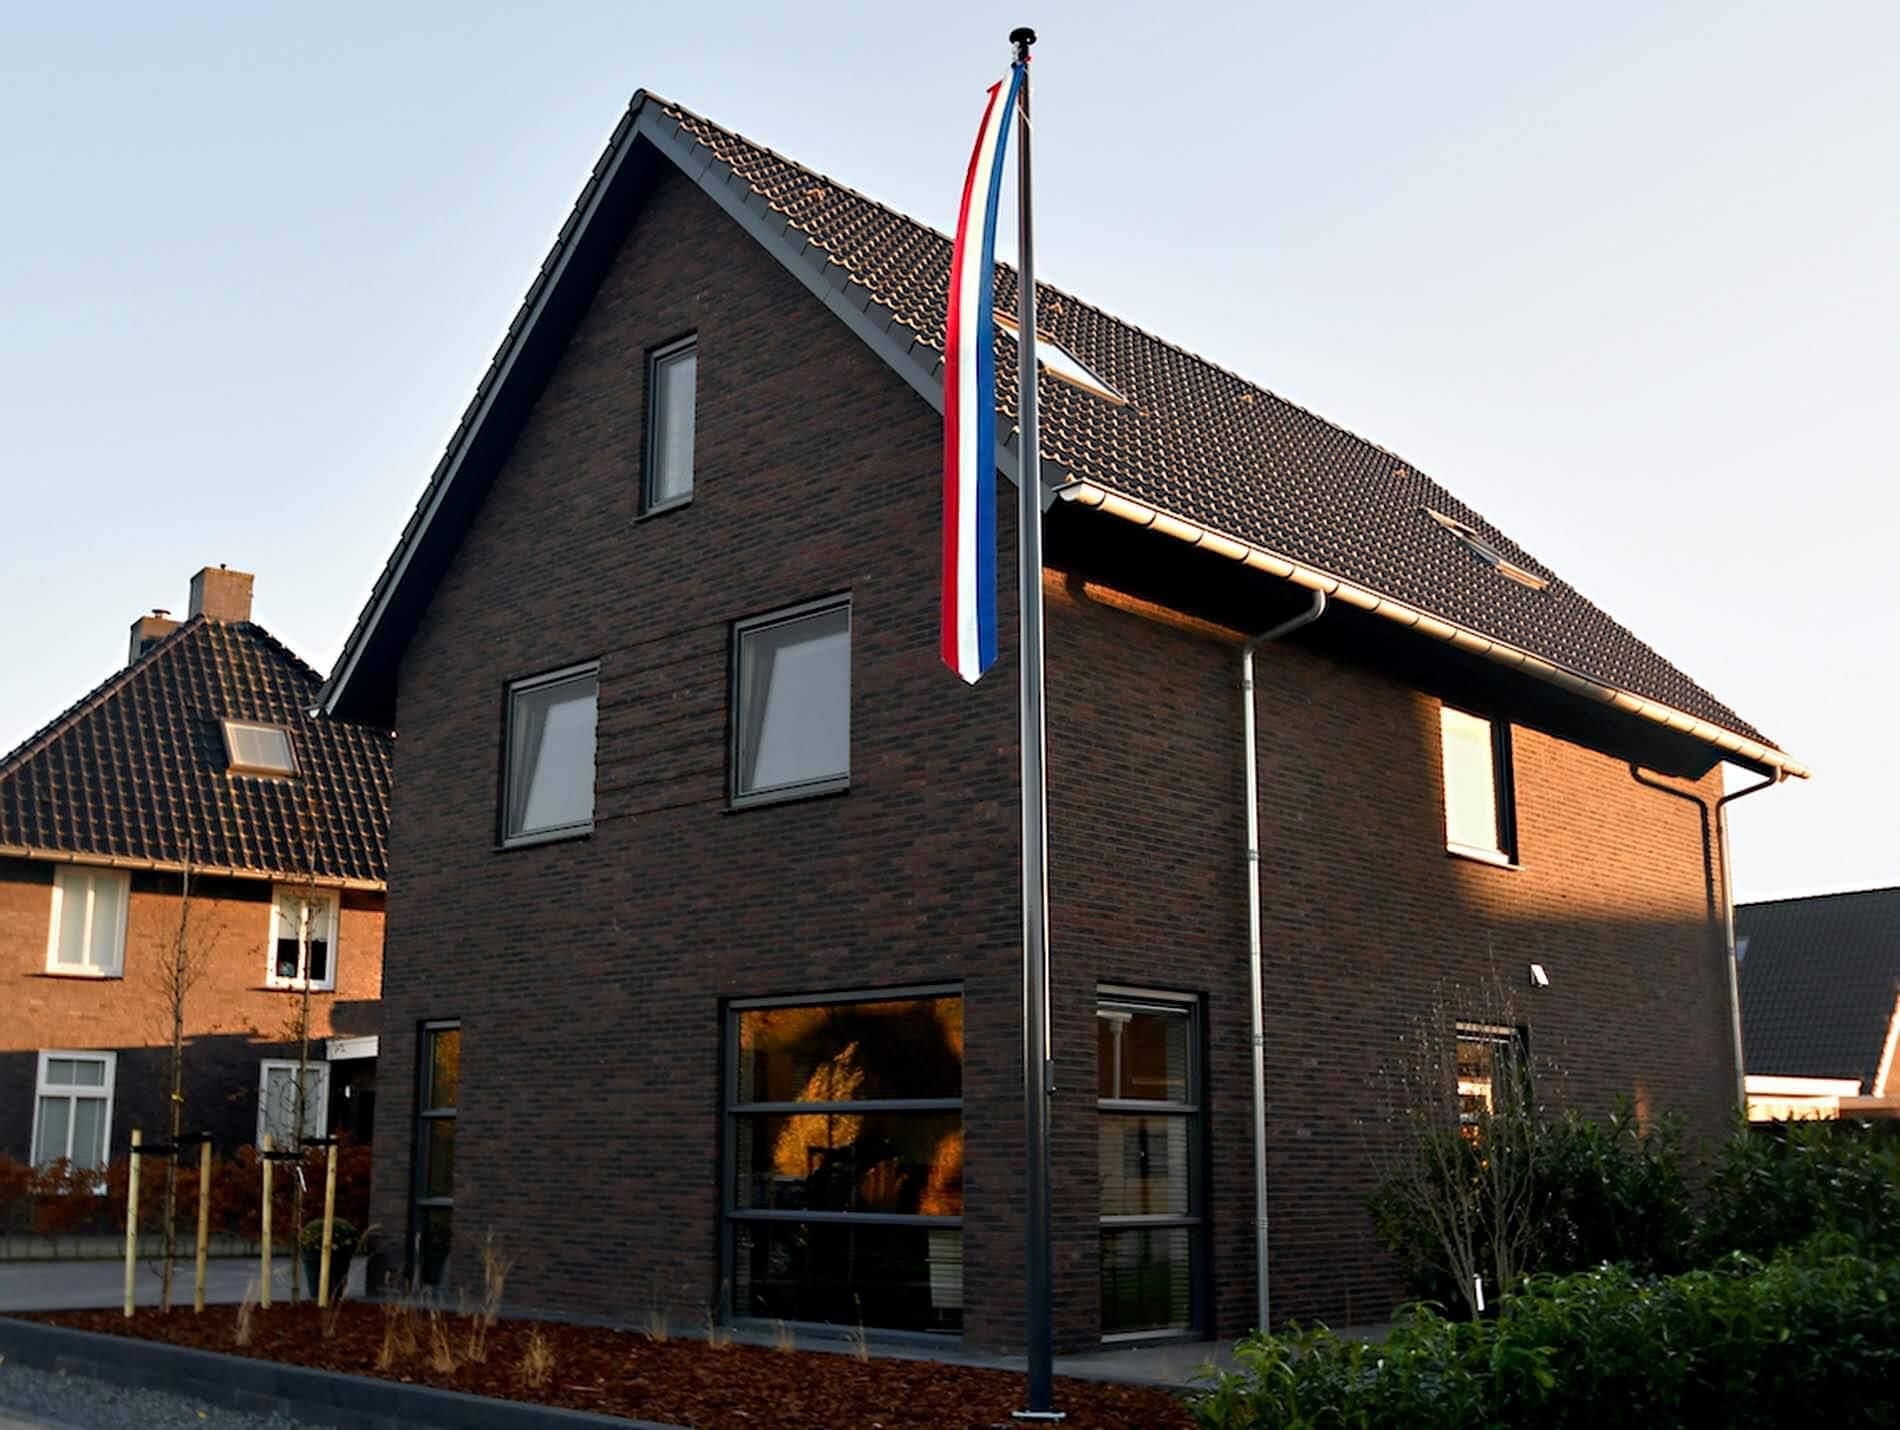 3. Drachten-nieuwbouw-woning-1900x1430p.jpg